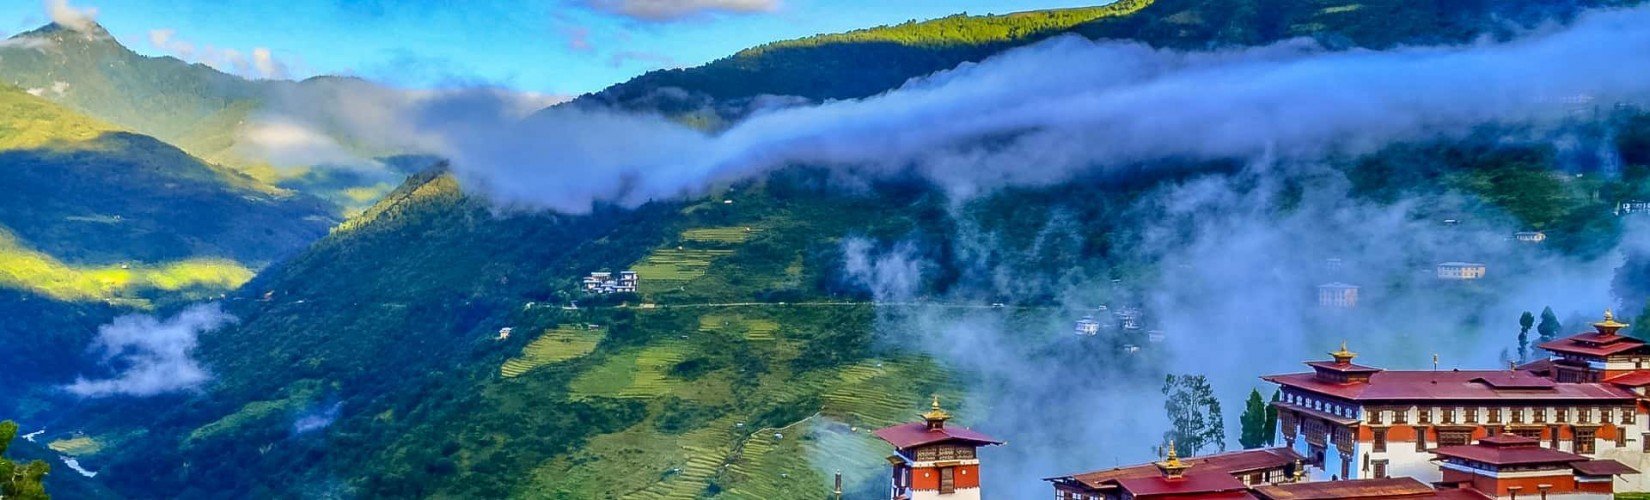 Highlights of Bhutan